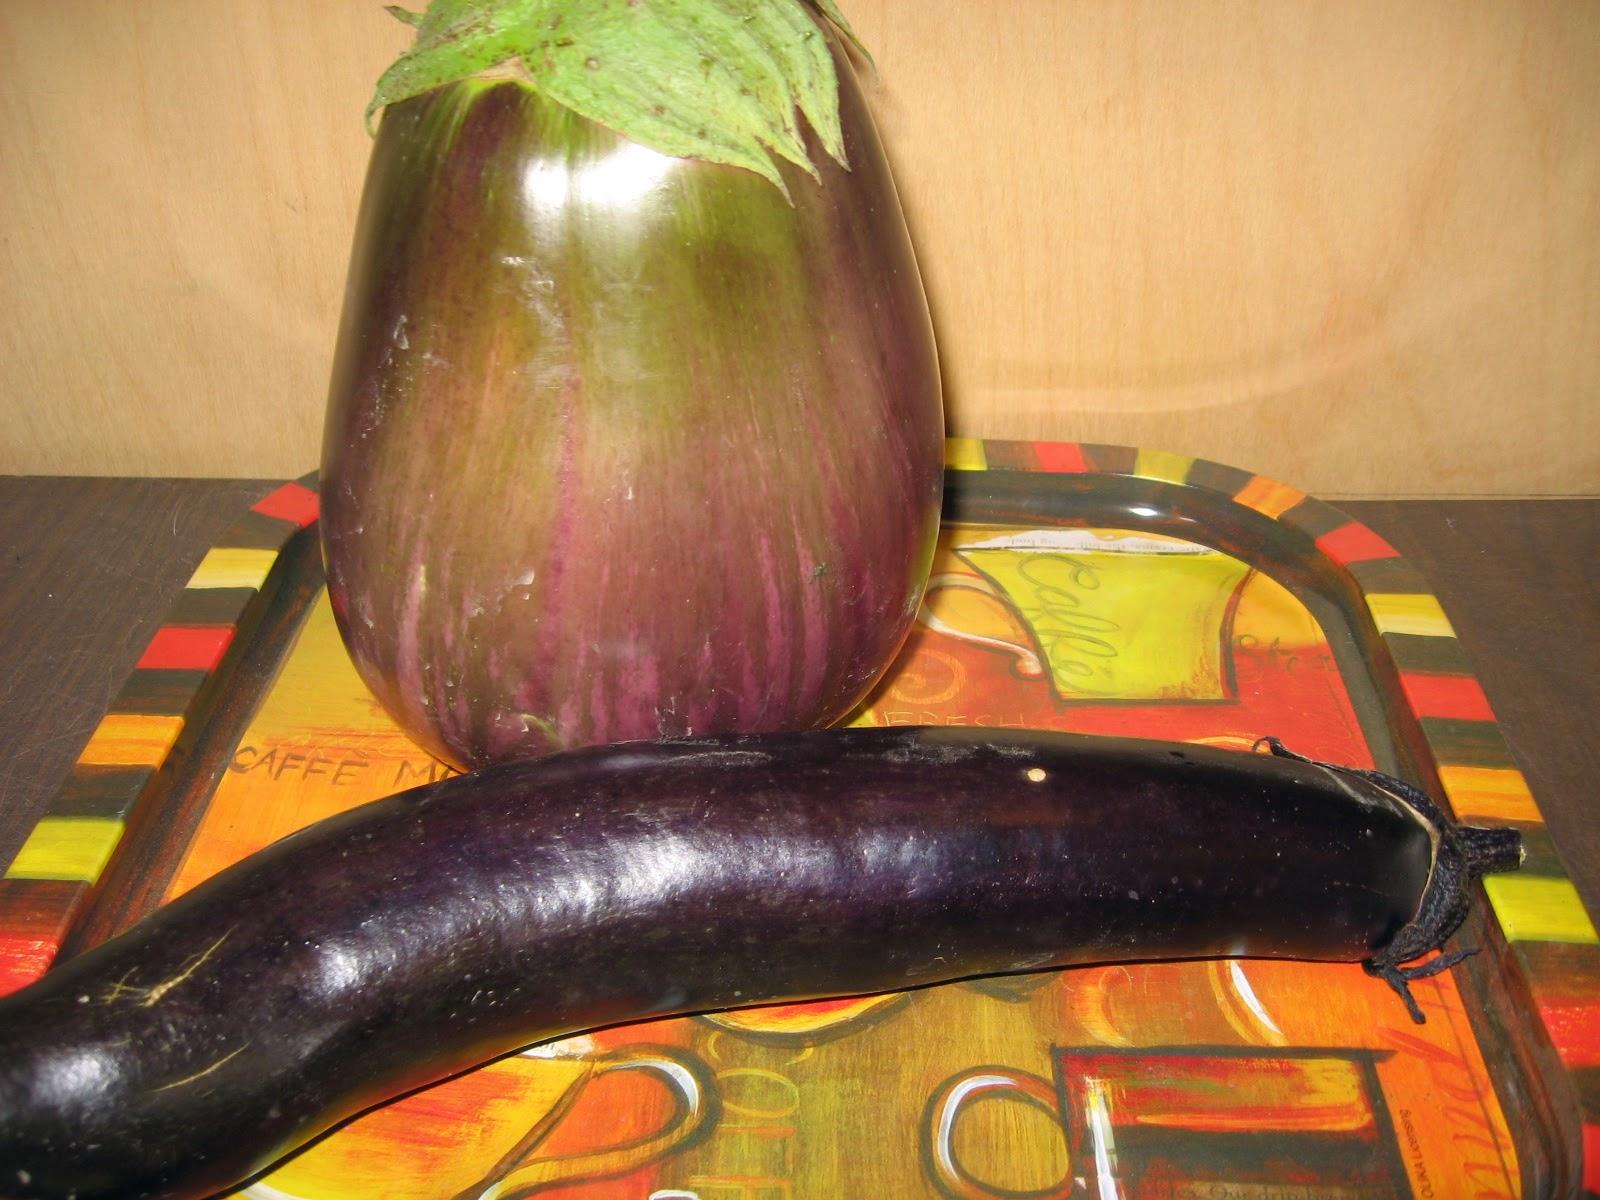 Italian and Japanese eggplant